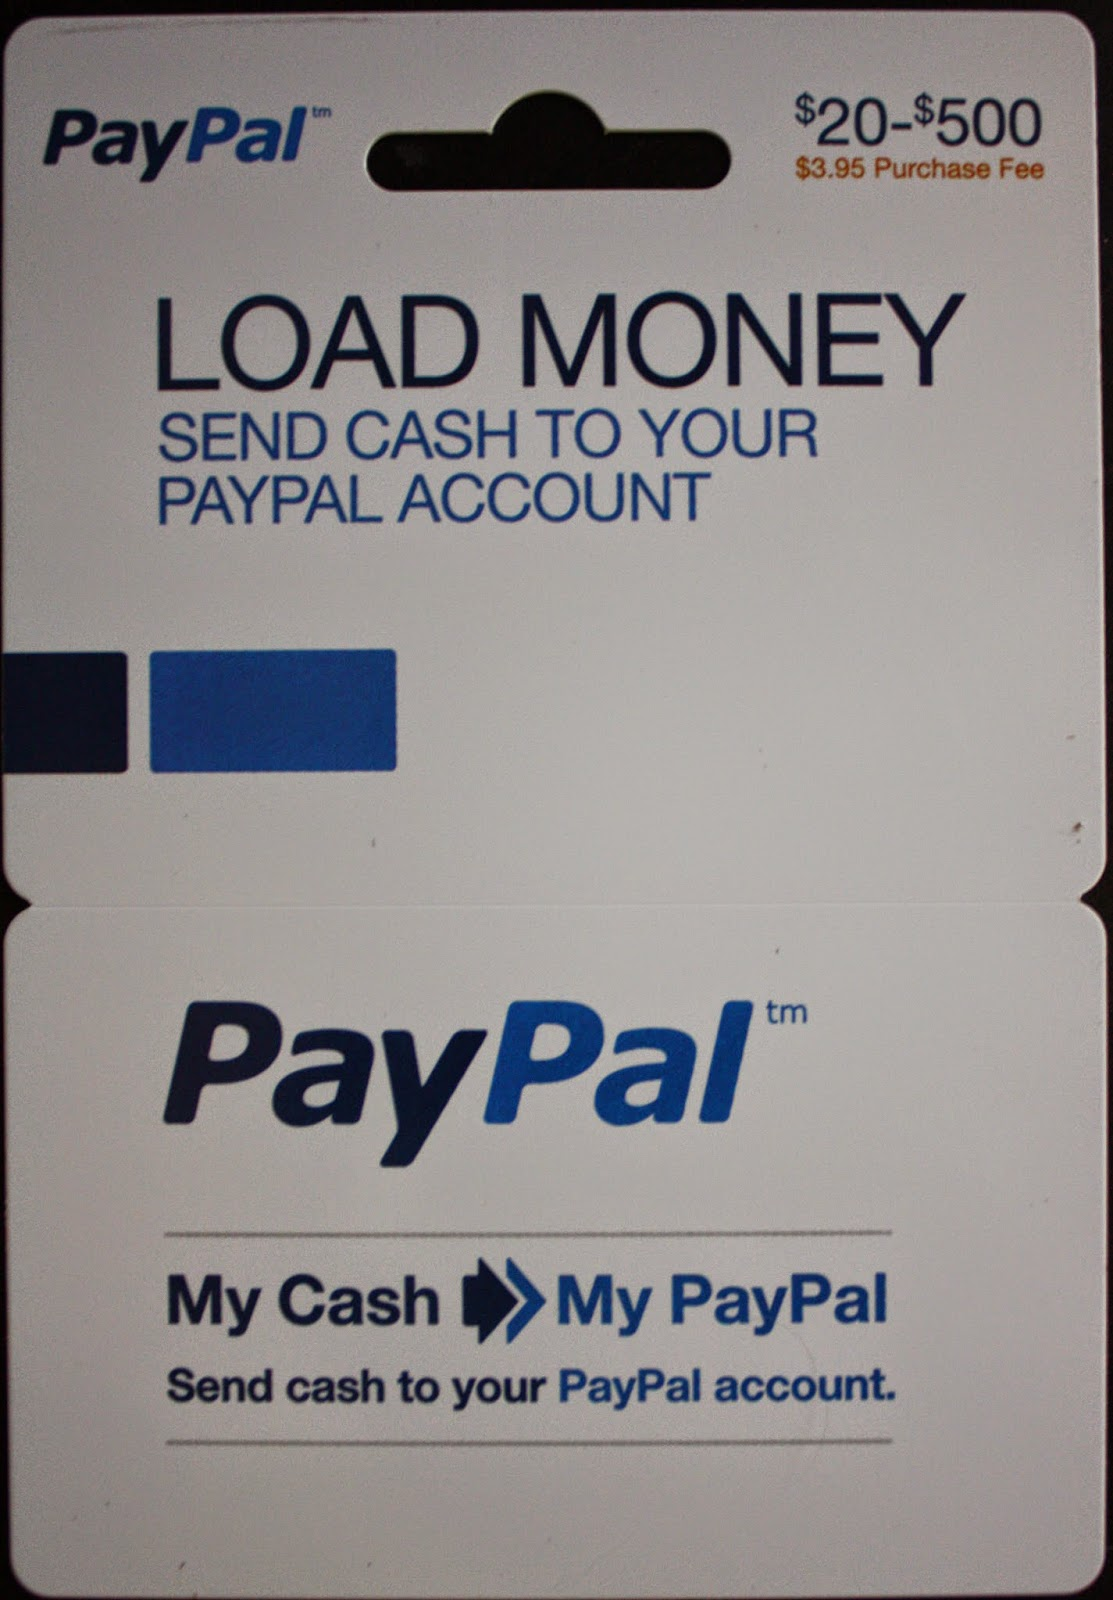 Activate Paypal Business Debit Card | Unlimitedgamers.co